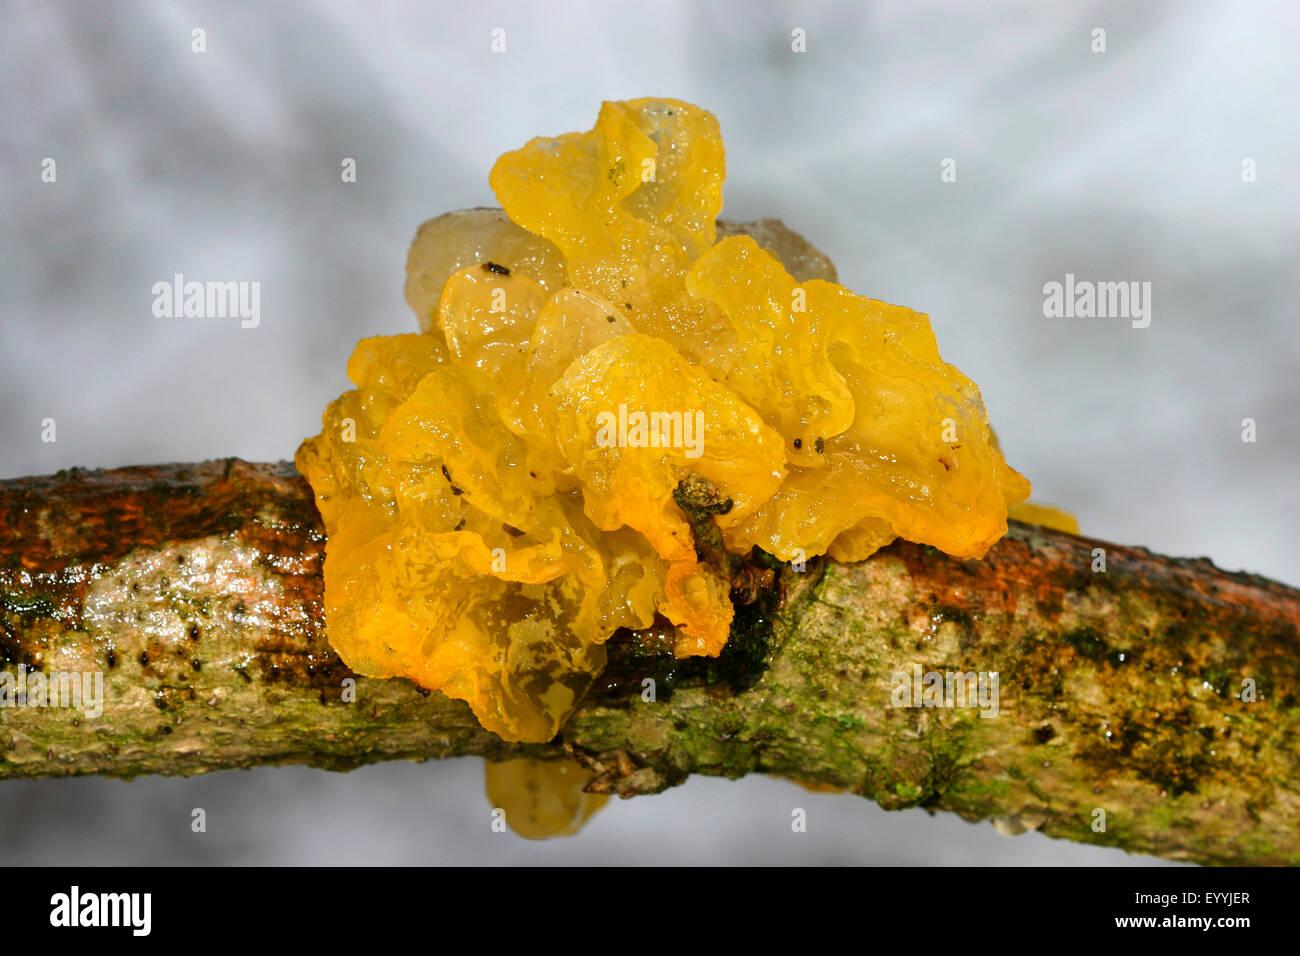 yellow brain (Tremella mesenterica), on deadwood, Germany - Stock Image